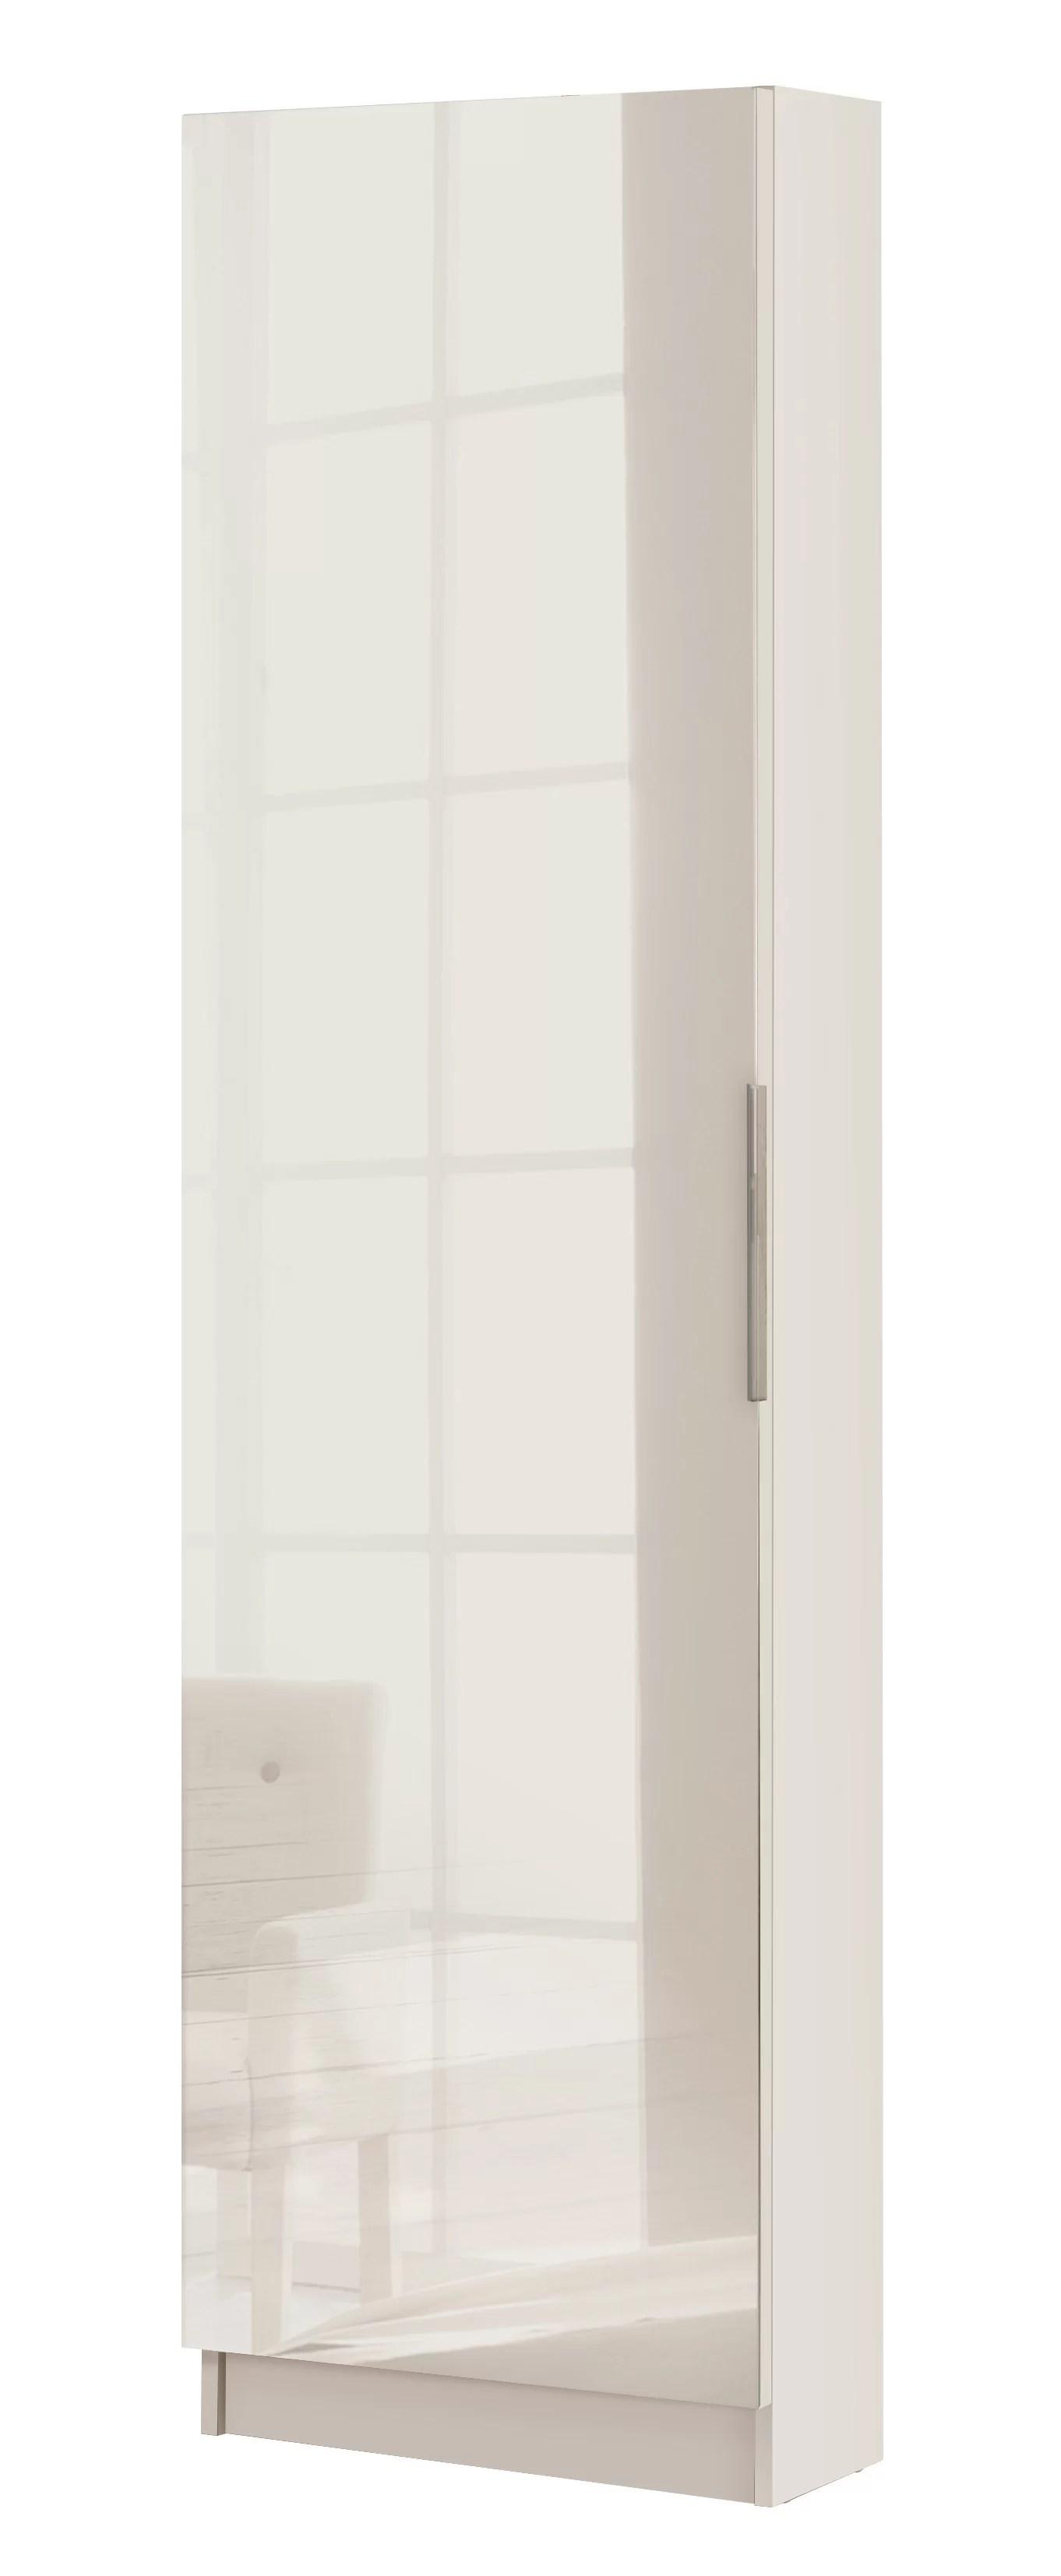 Home Etc Schuhschrank Lilien Für 12 Paar & Bewertungen | Wayfair.De